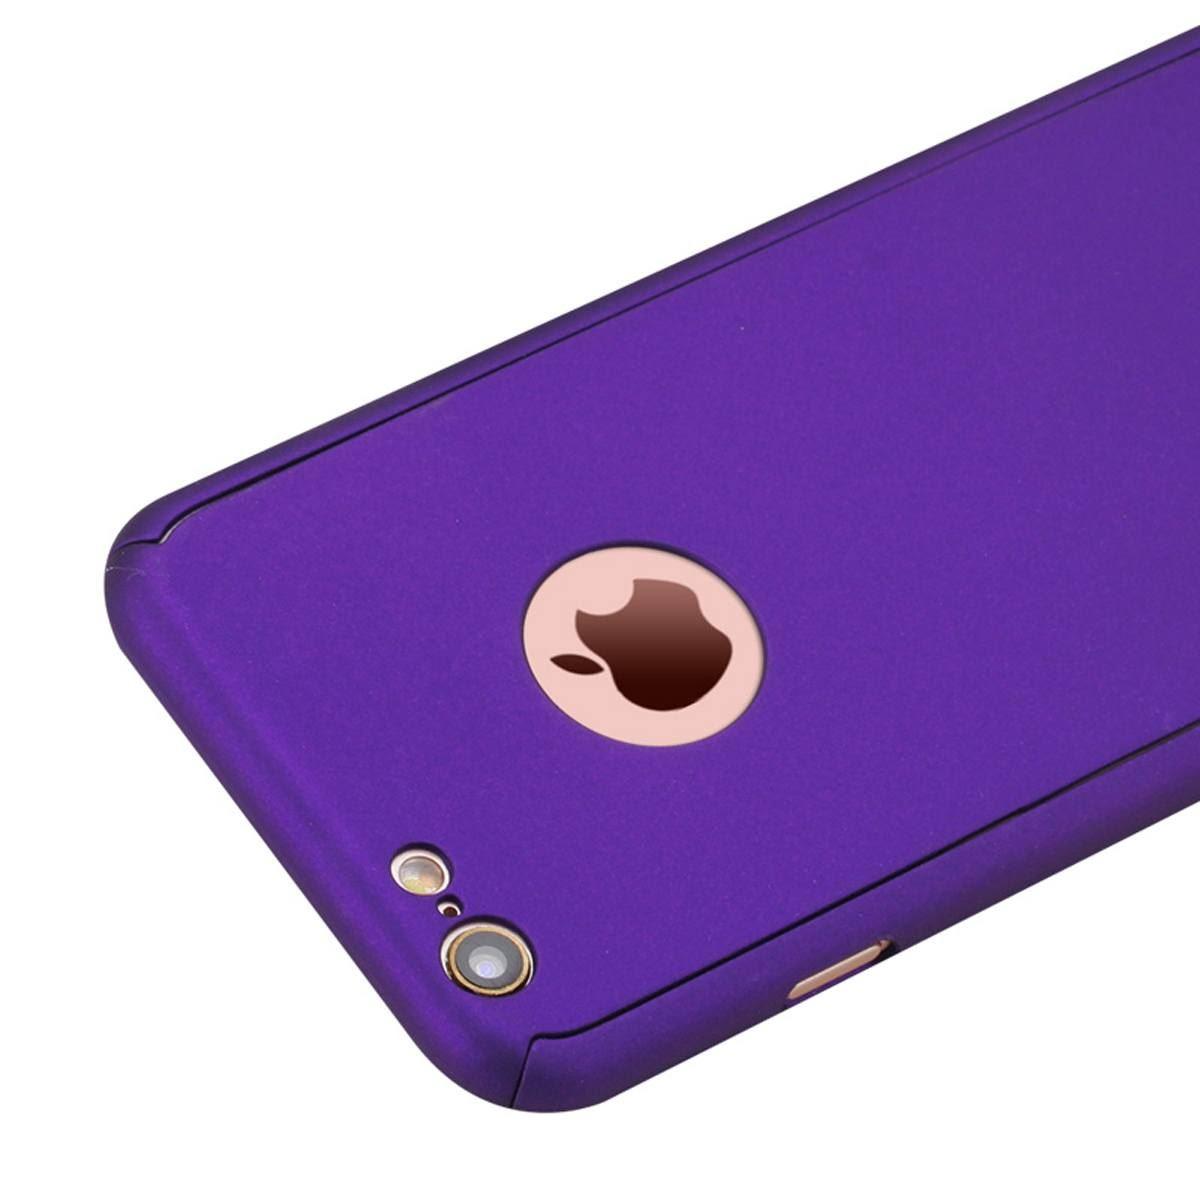 For-Apple-iPhone-XS-Max-XR-Hybrid-360-Slim-Ultra-Thin-Heavy-Duty-Shockproof-Case Indexbild 84